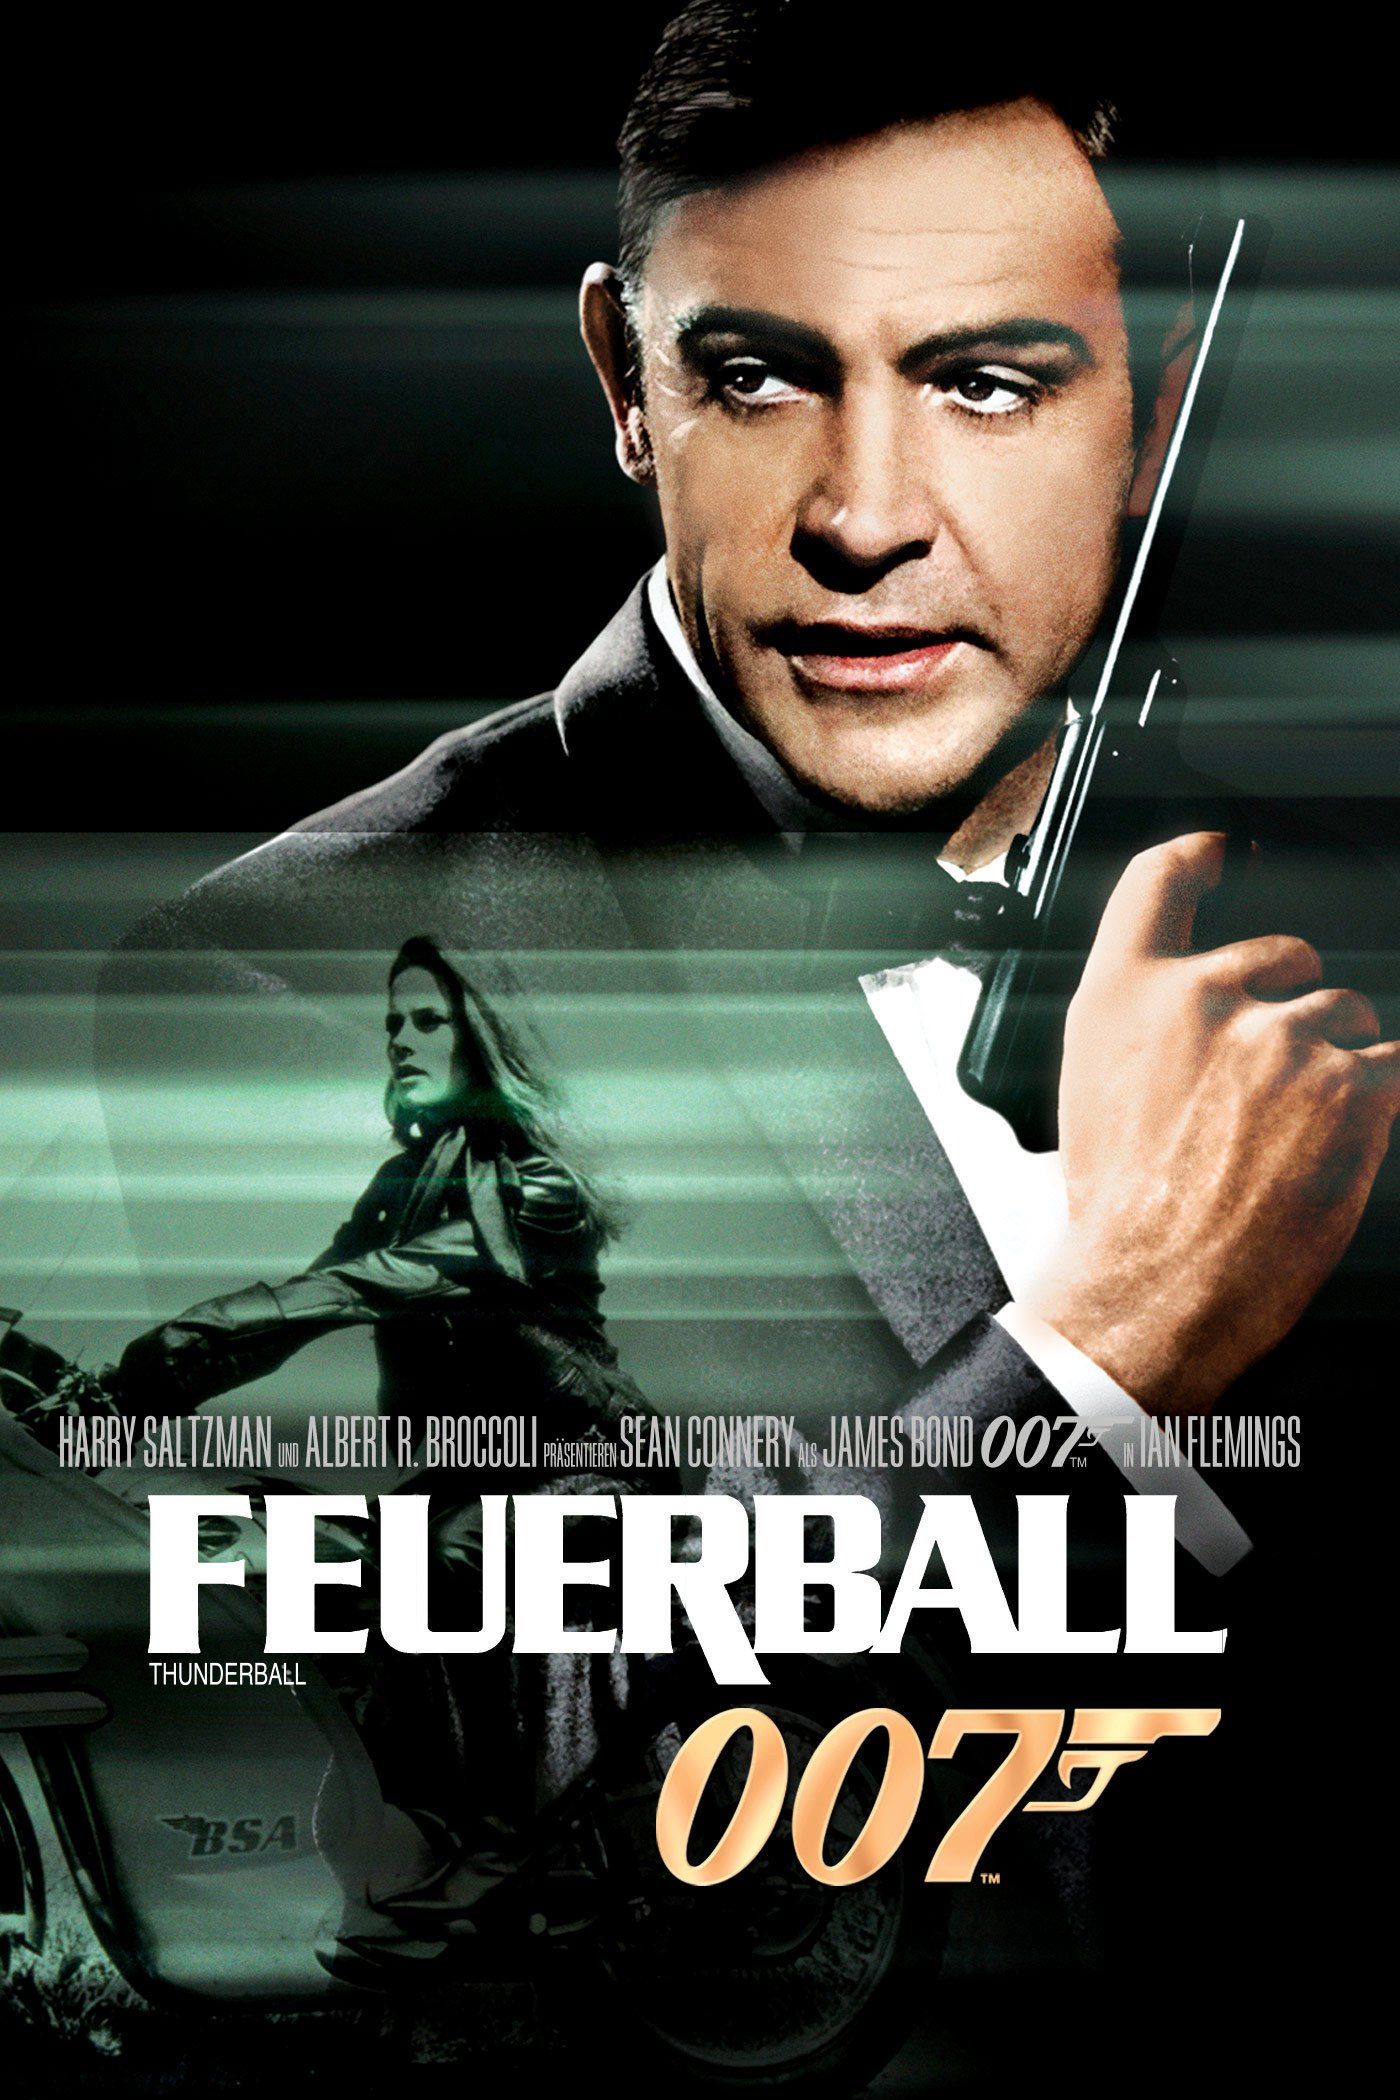 """James Bond 007 - Feuerball"""